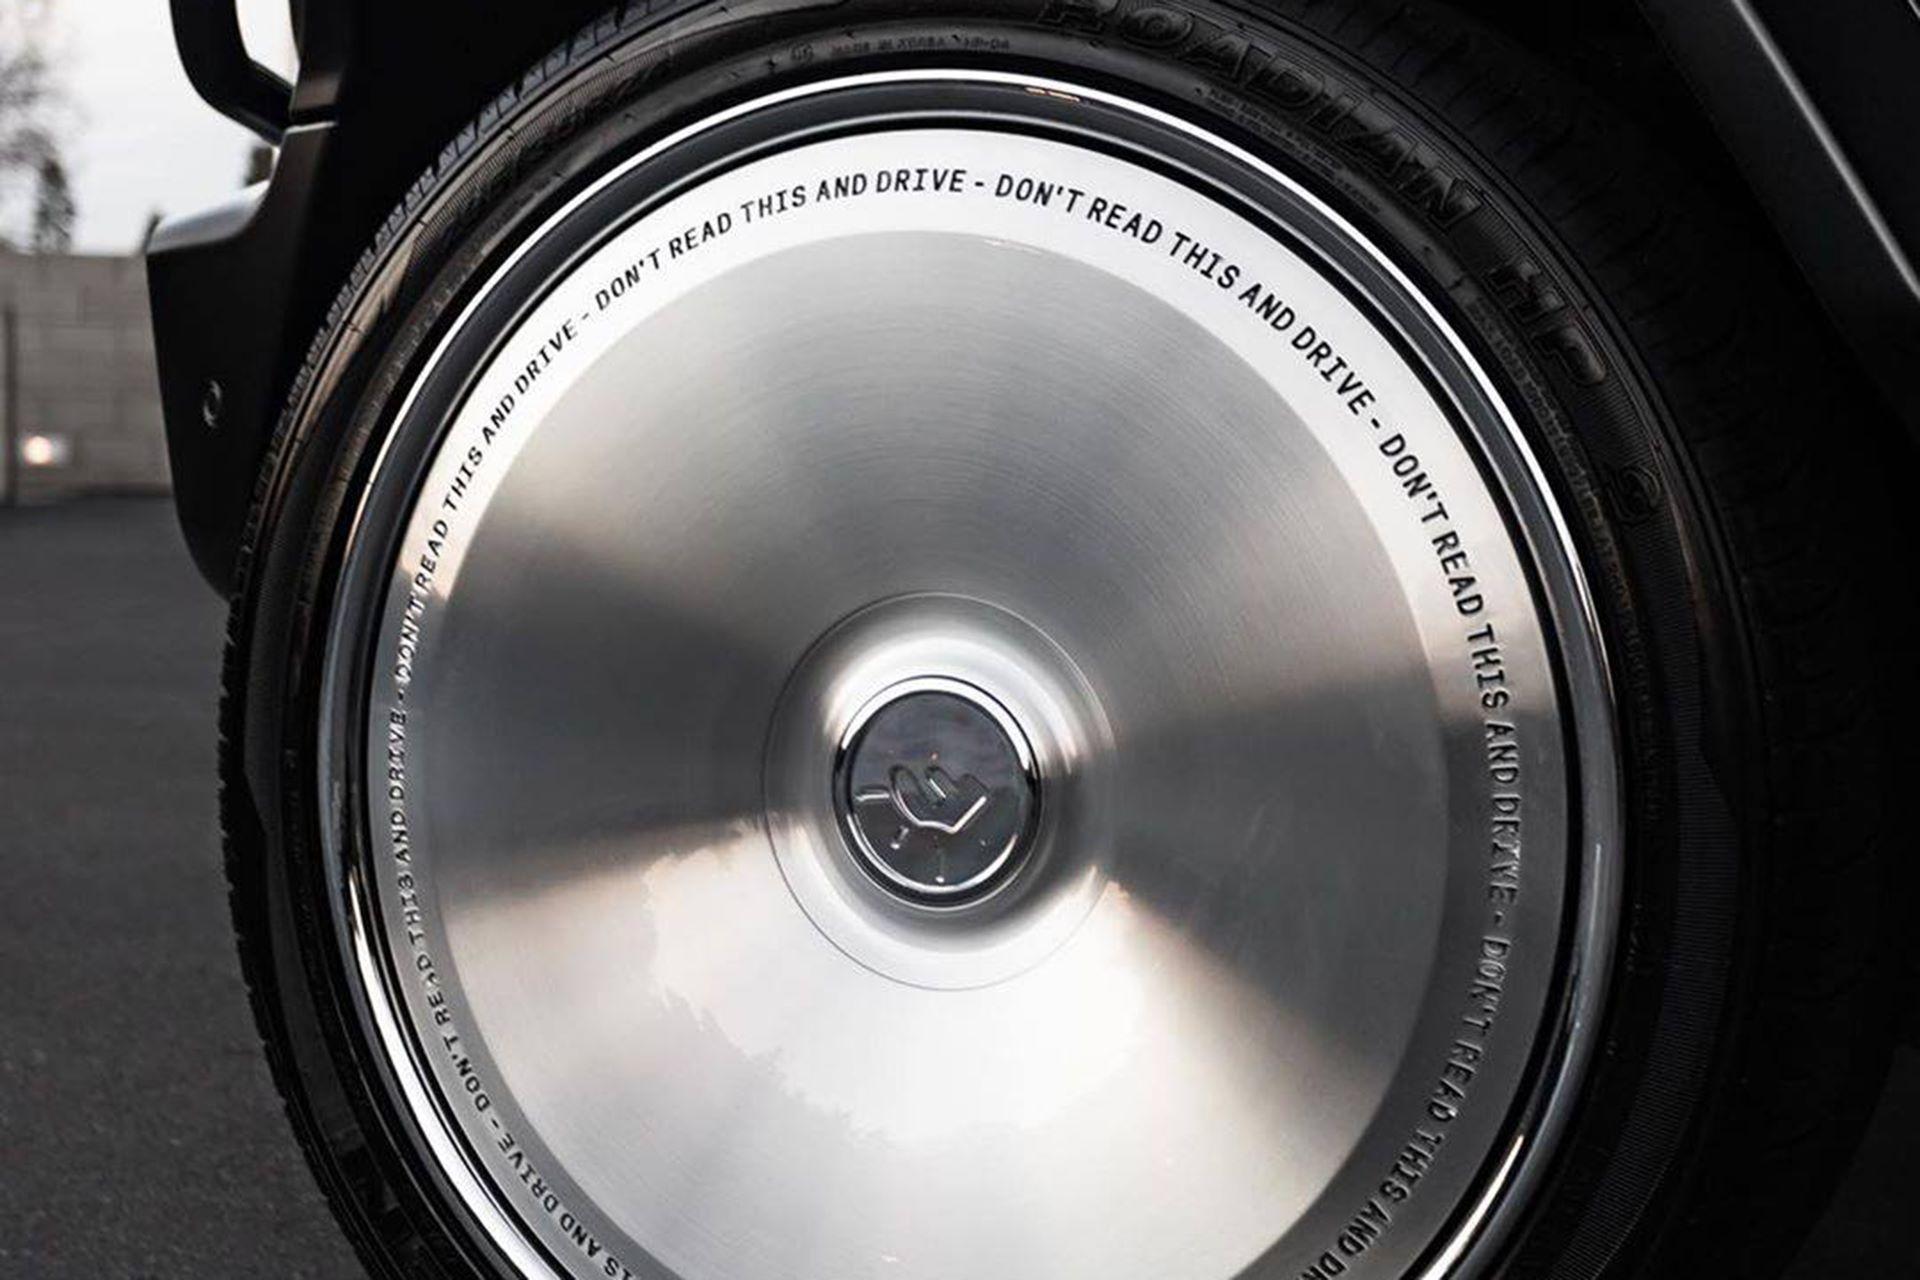 Forgiato-Cactus-Jack-wheels-4